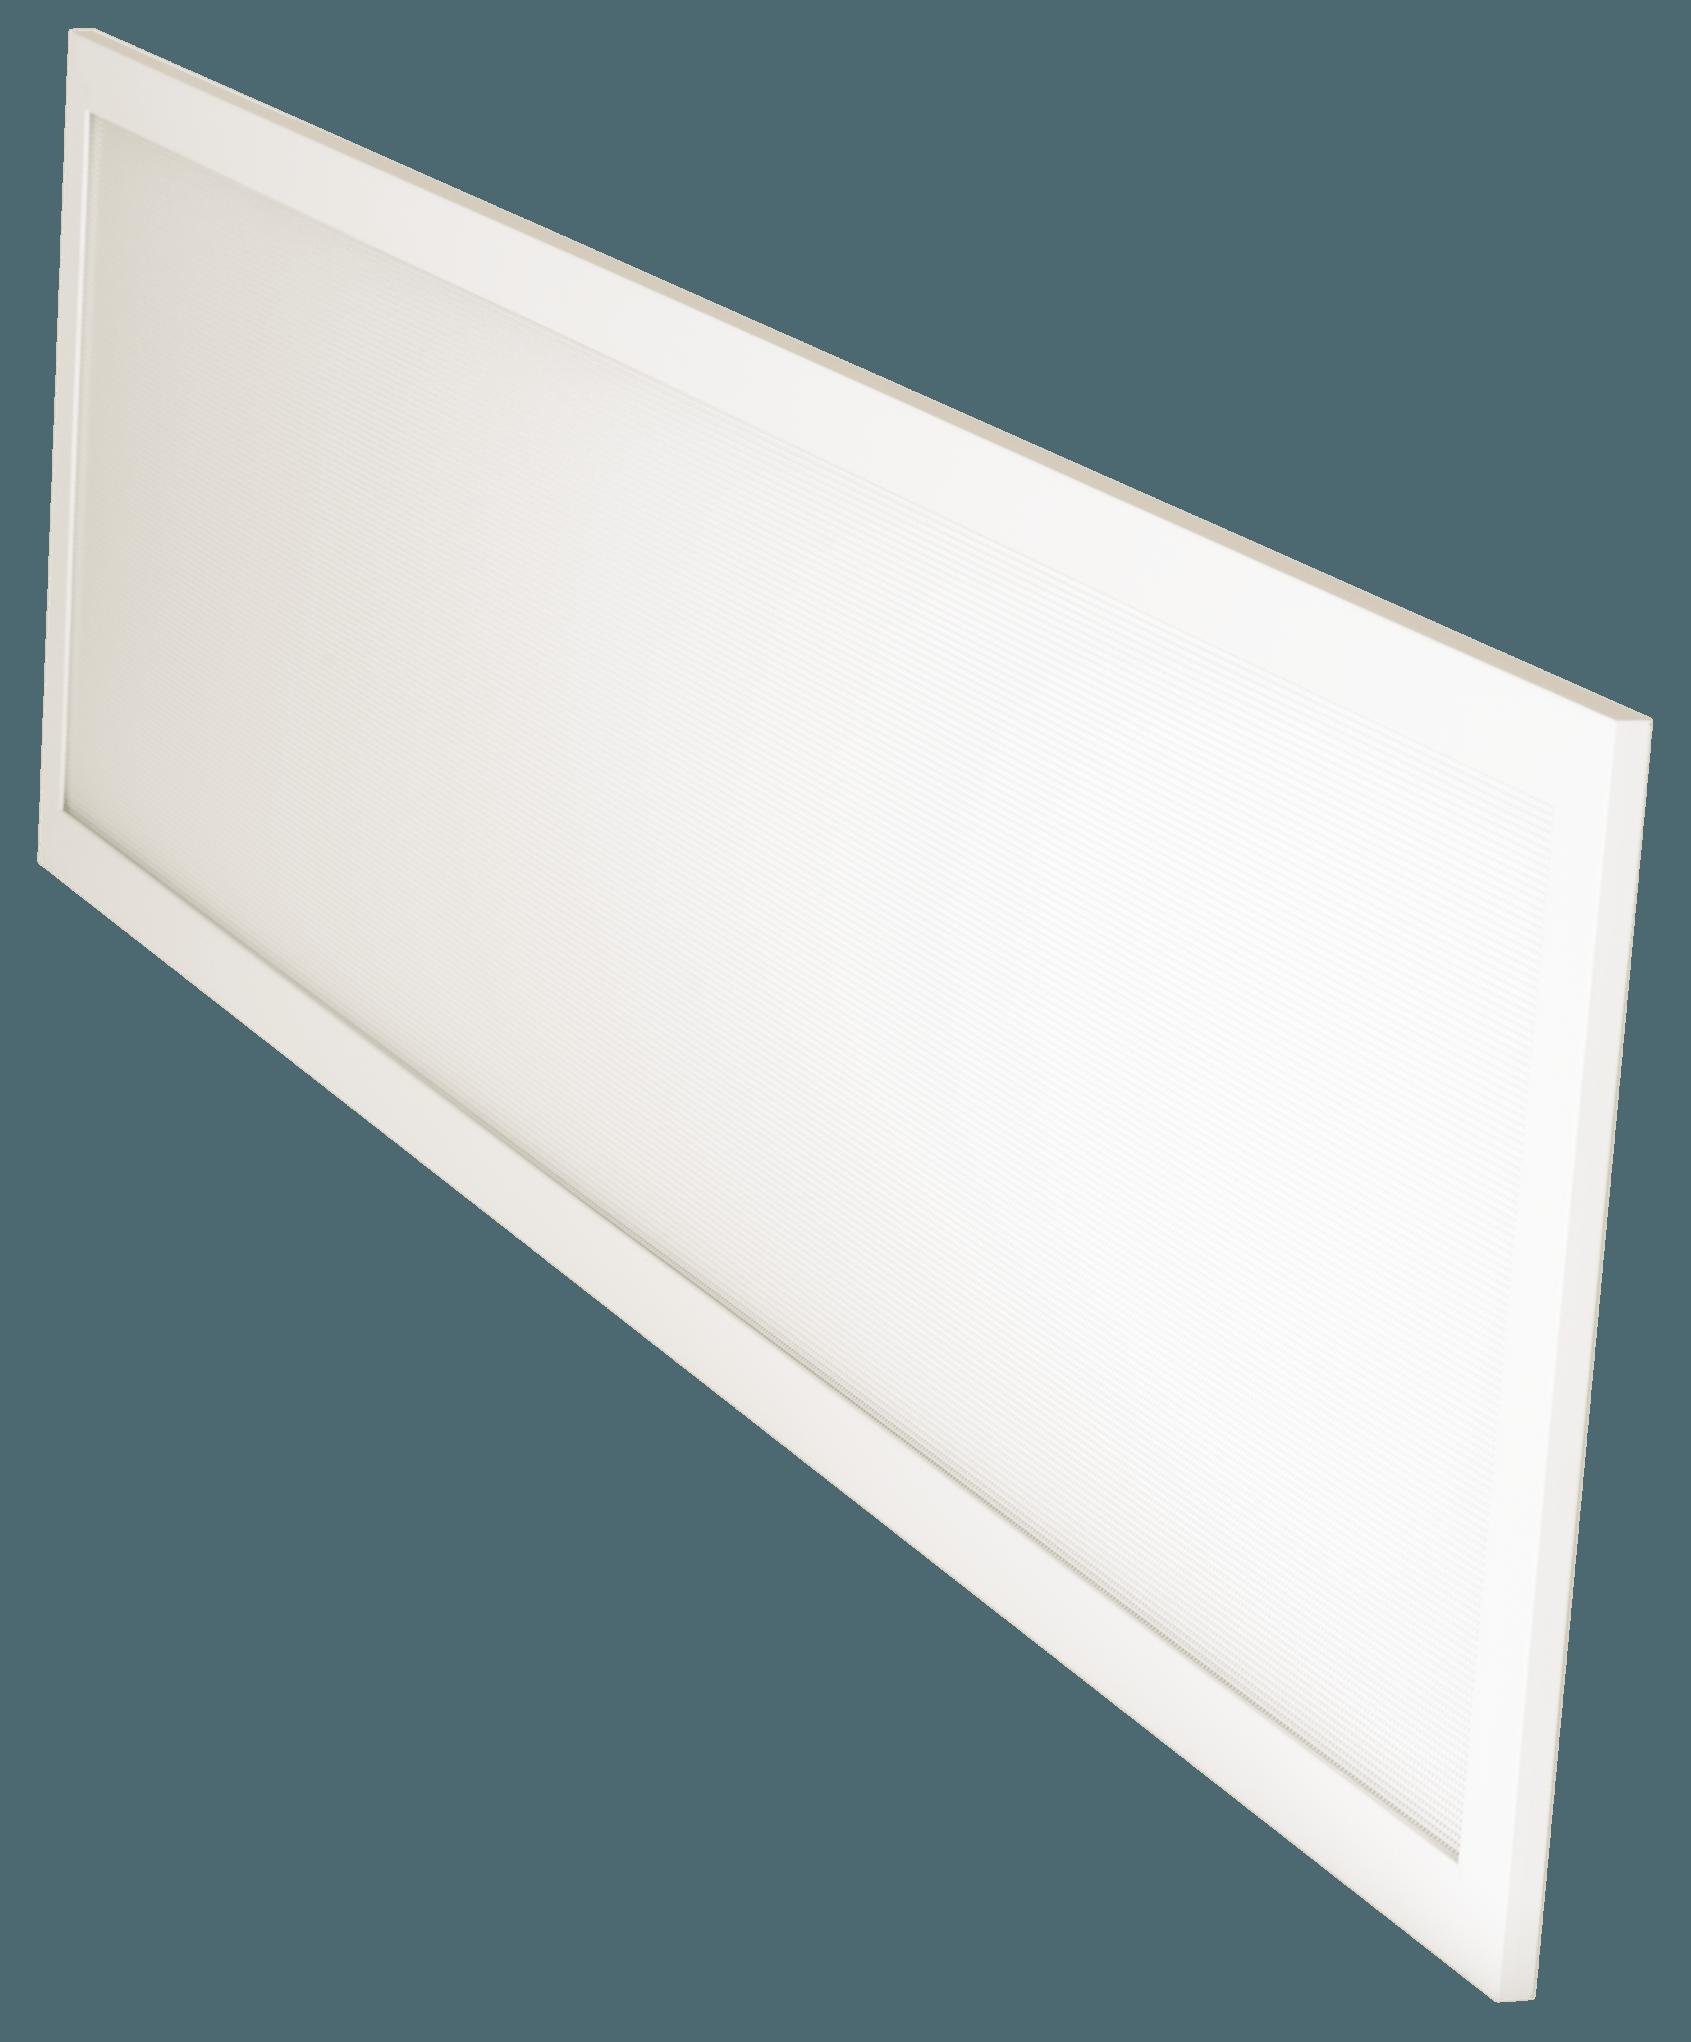 new styles 504c1 71e5e LED Panel Light 1x4 (2-Pack)